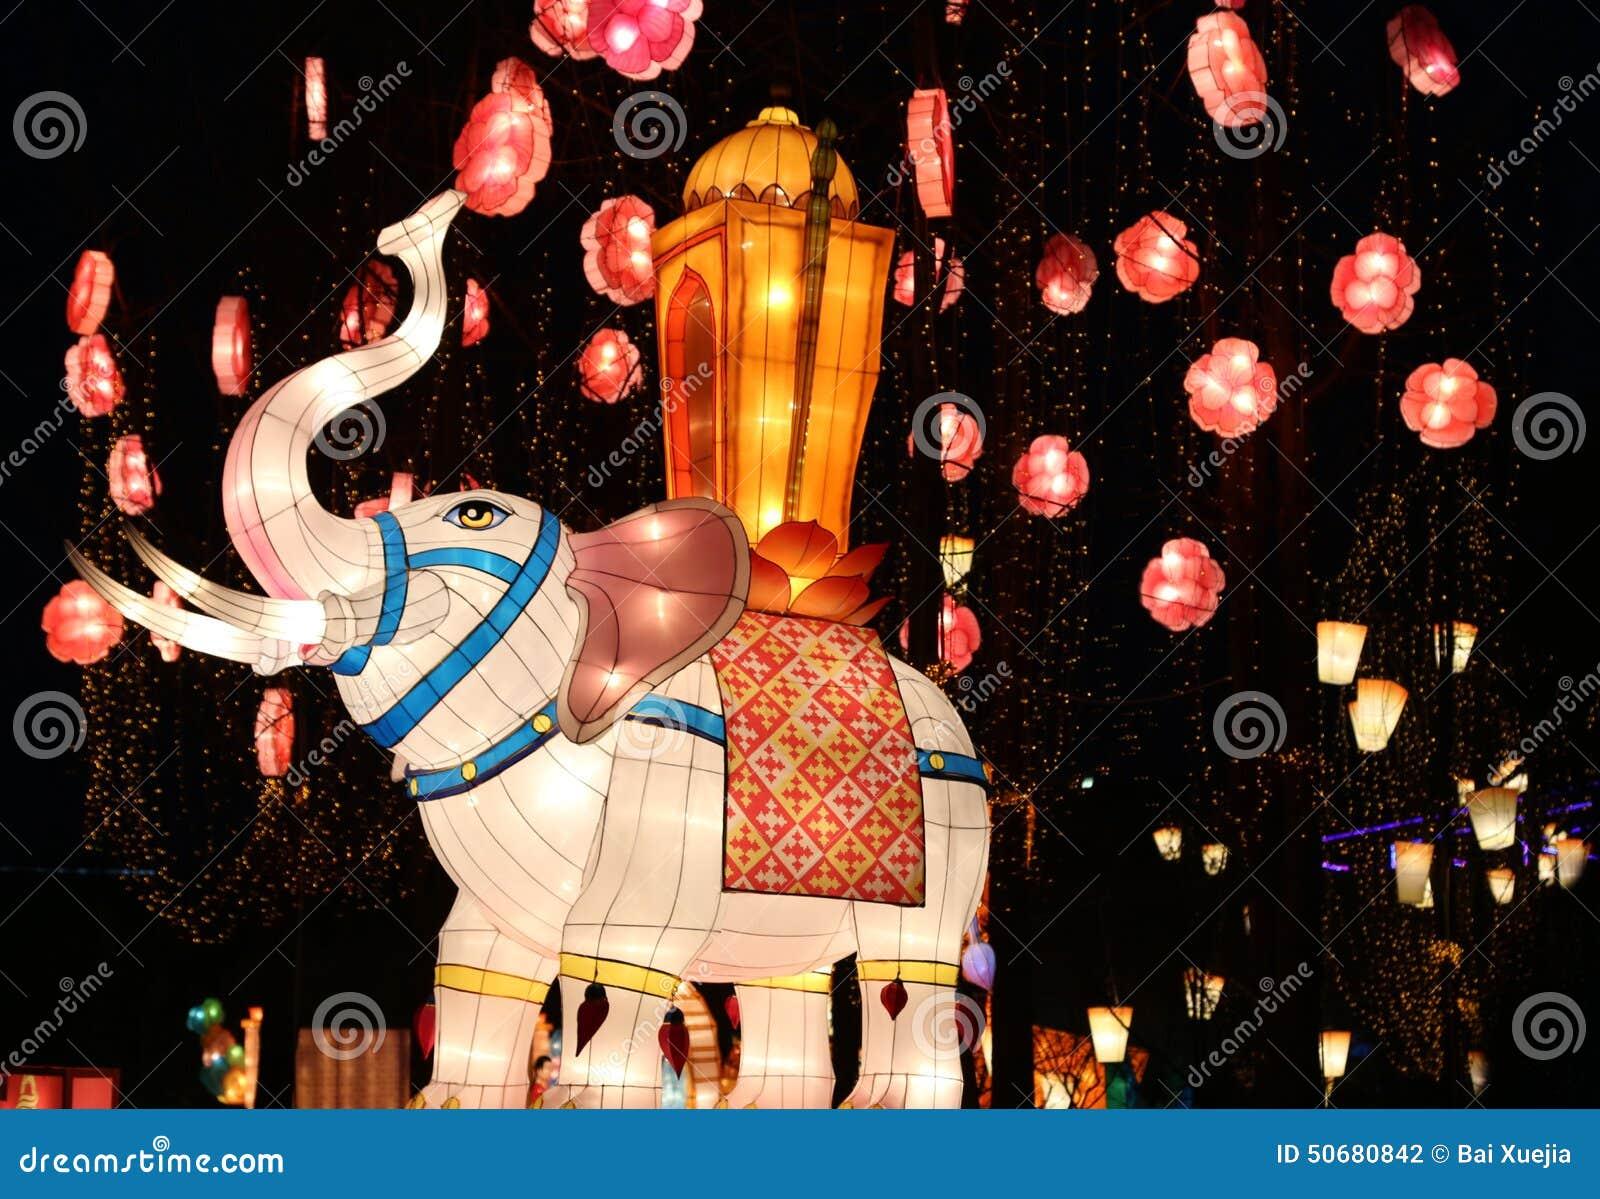 Download 灯会,成都,在2015年中国 图库摄影片. 图片 包括有 空间, 成都, 大象, 活动, 艺术, 重新创建 - 50680842